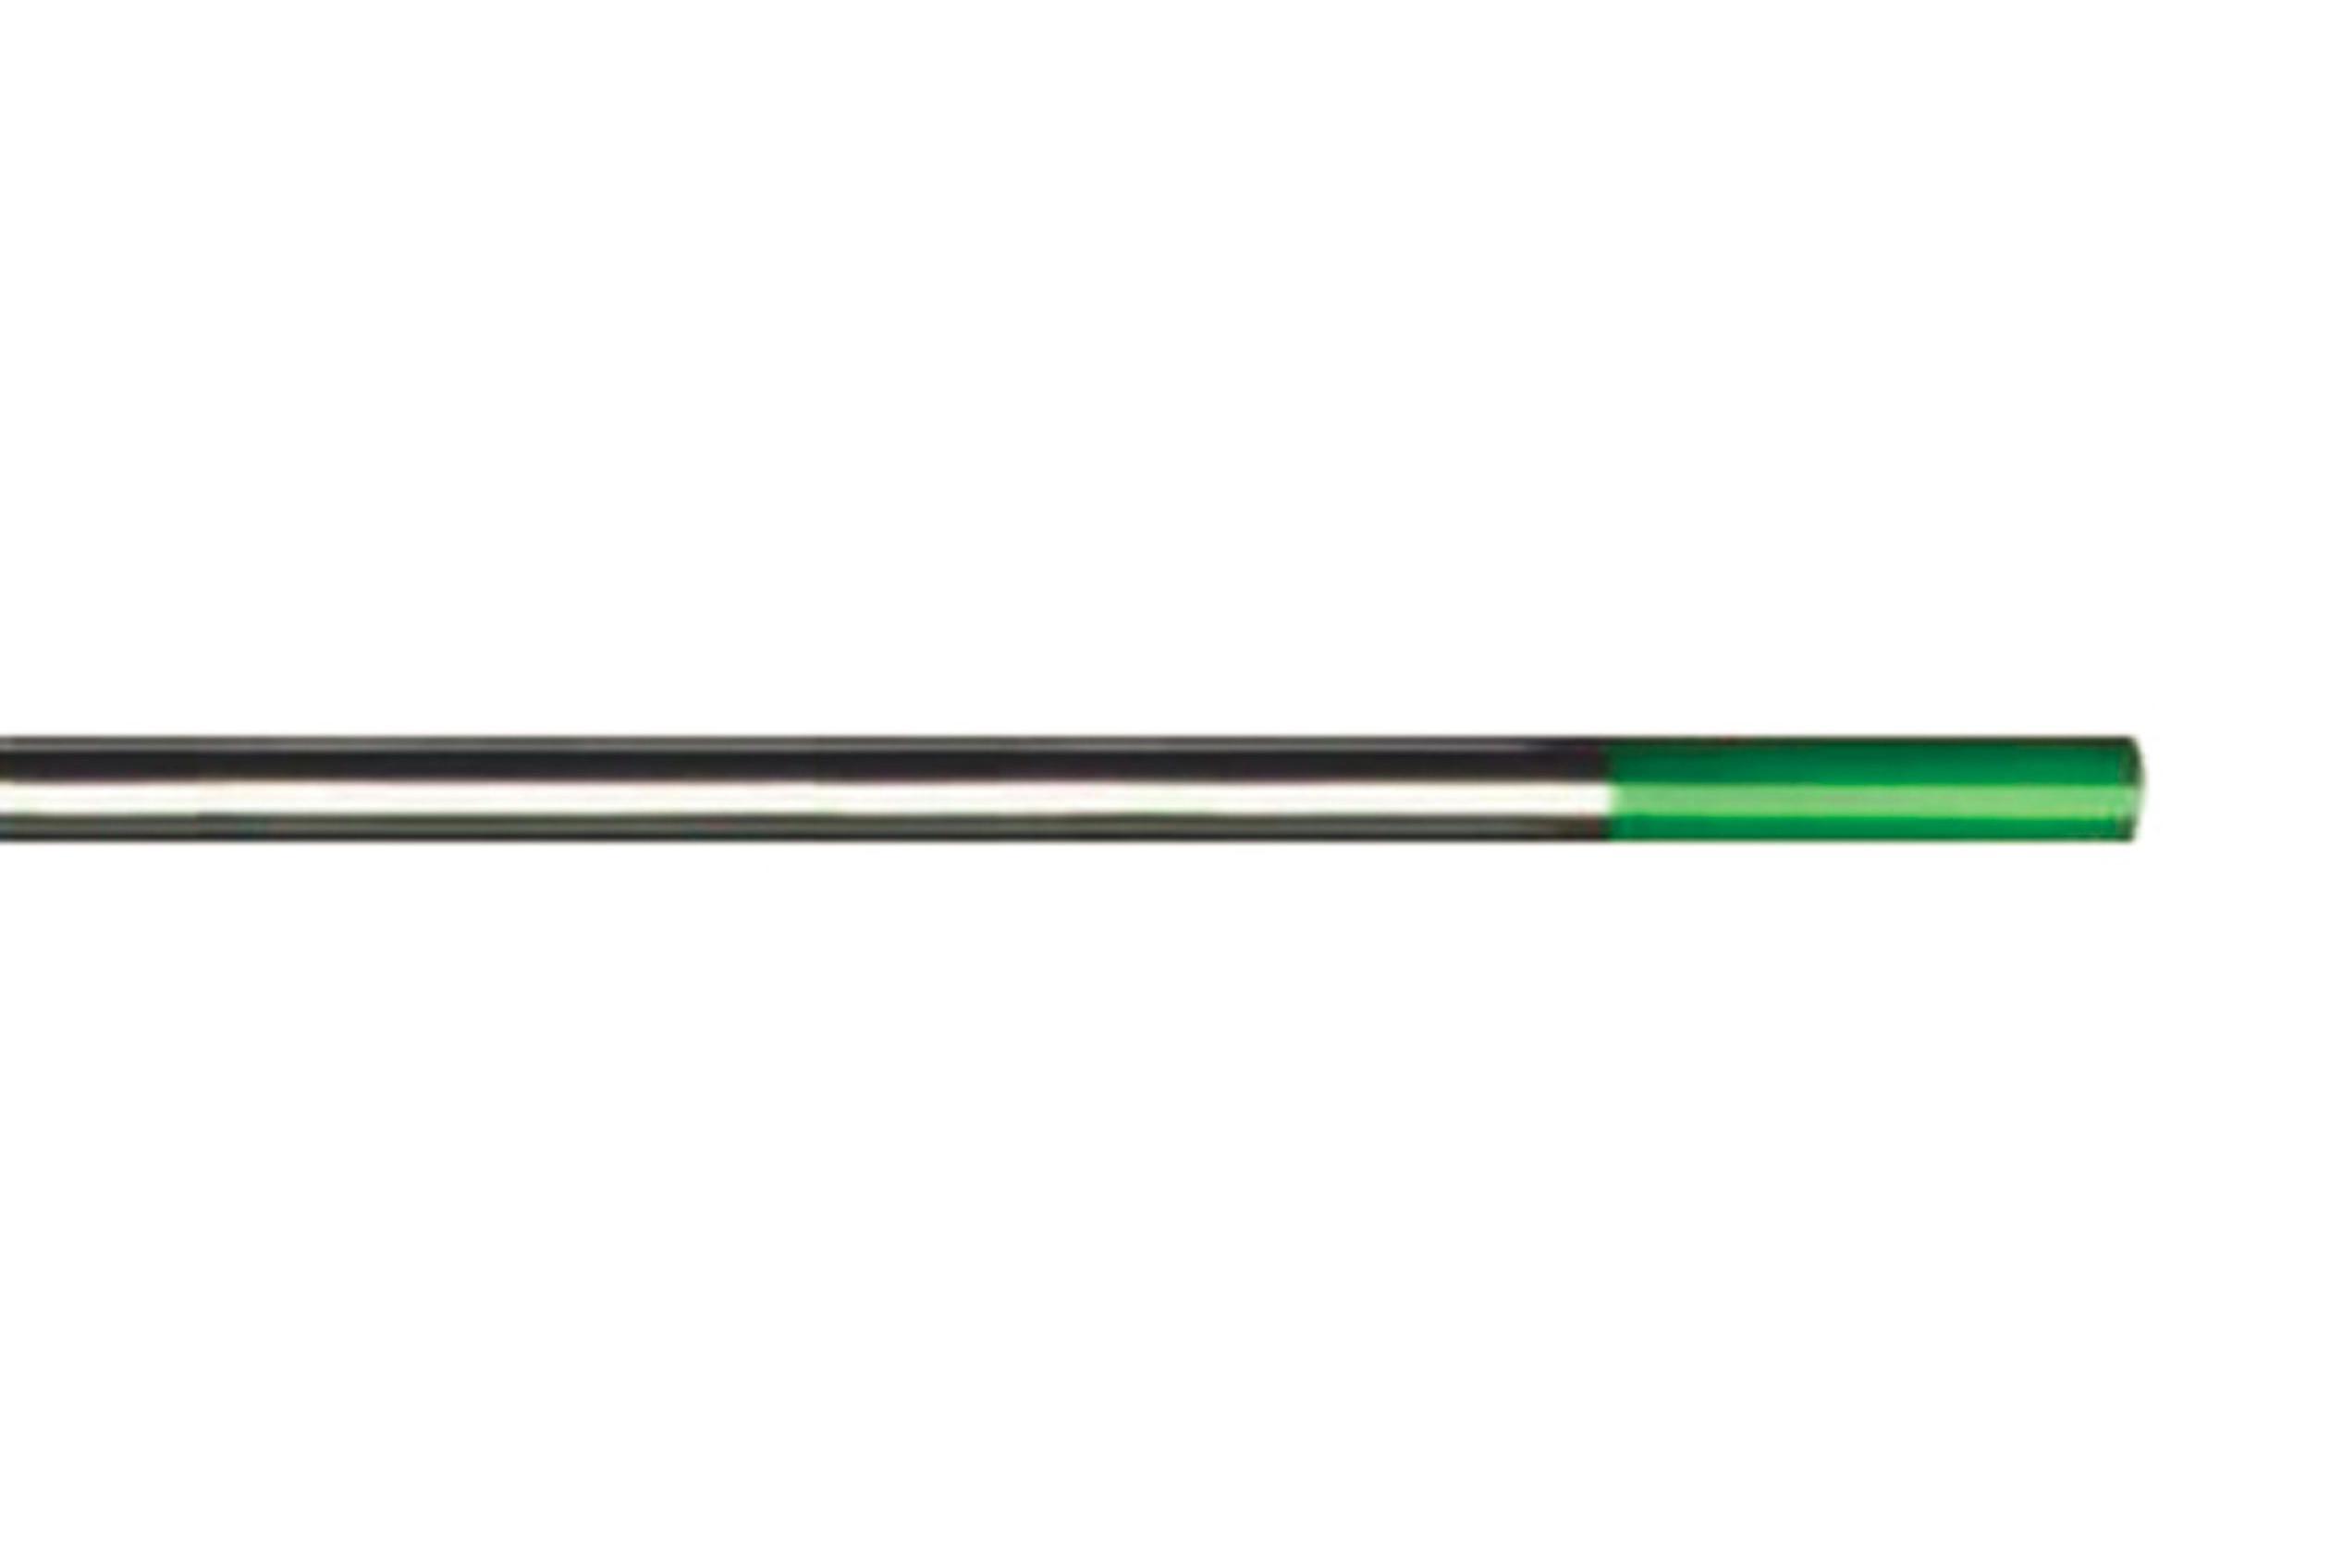 Электроды для сварки Gce Wp (400p020175sb) колонка юнкерс wp 275 bar